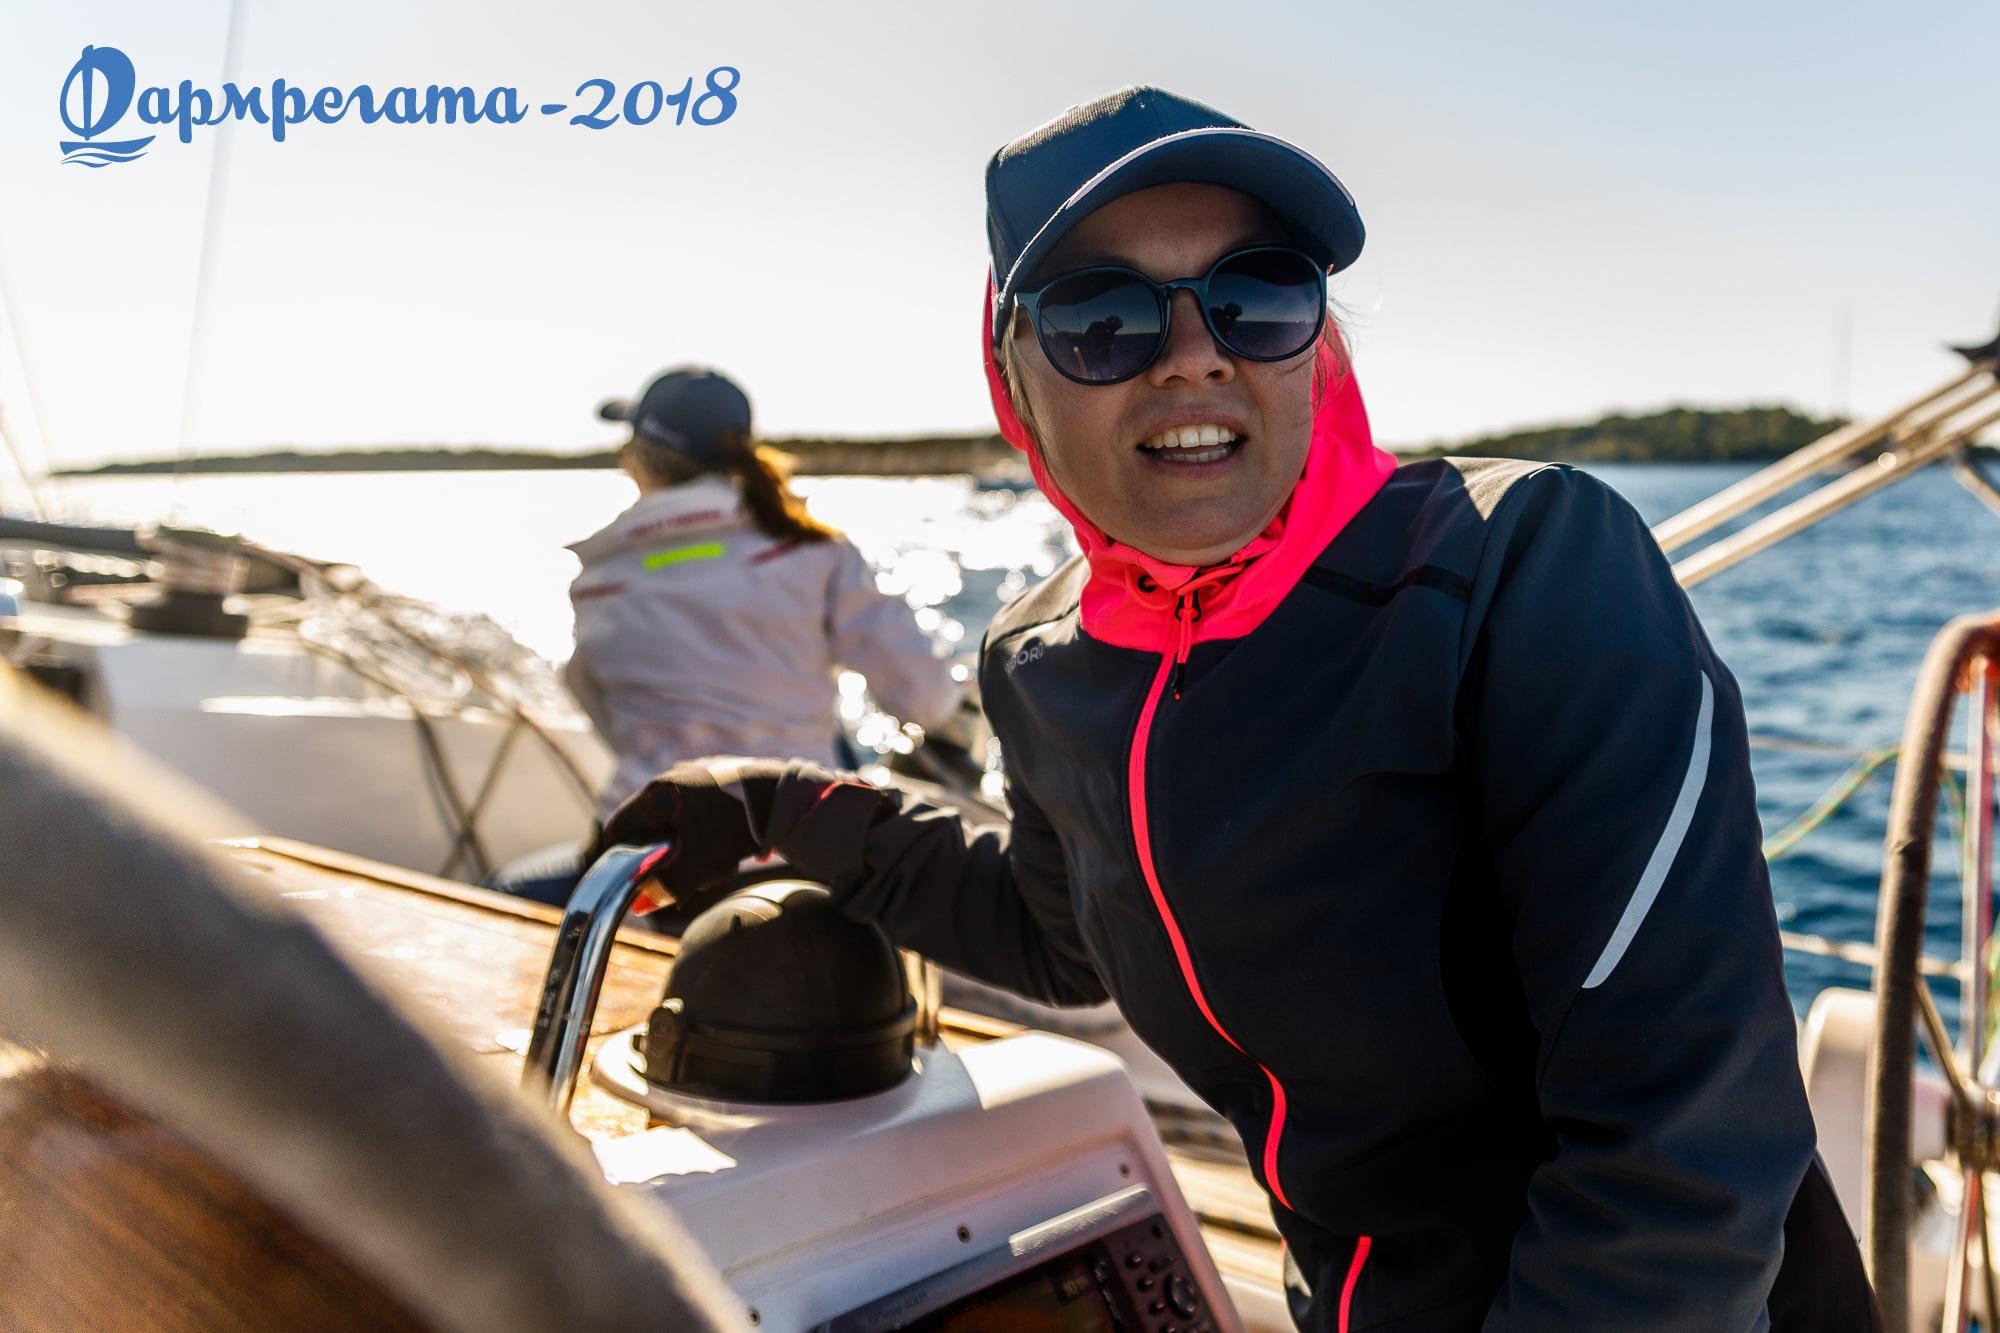 Яхтинг, путешествие - ДСМ групп Фармрегата 2018 - DSM Group Pharmregata 2018